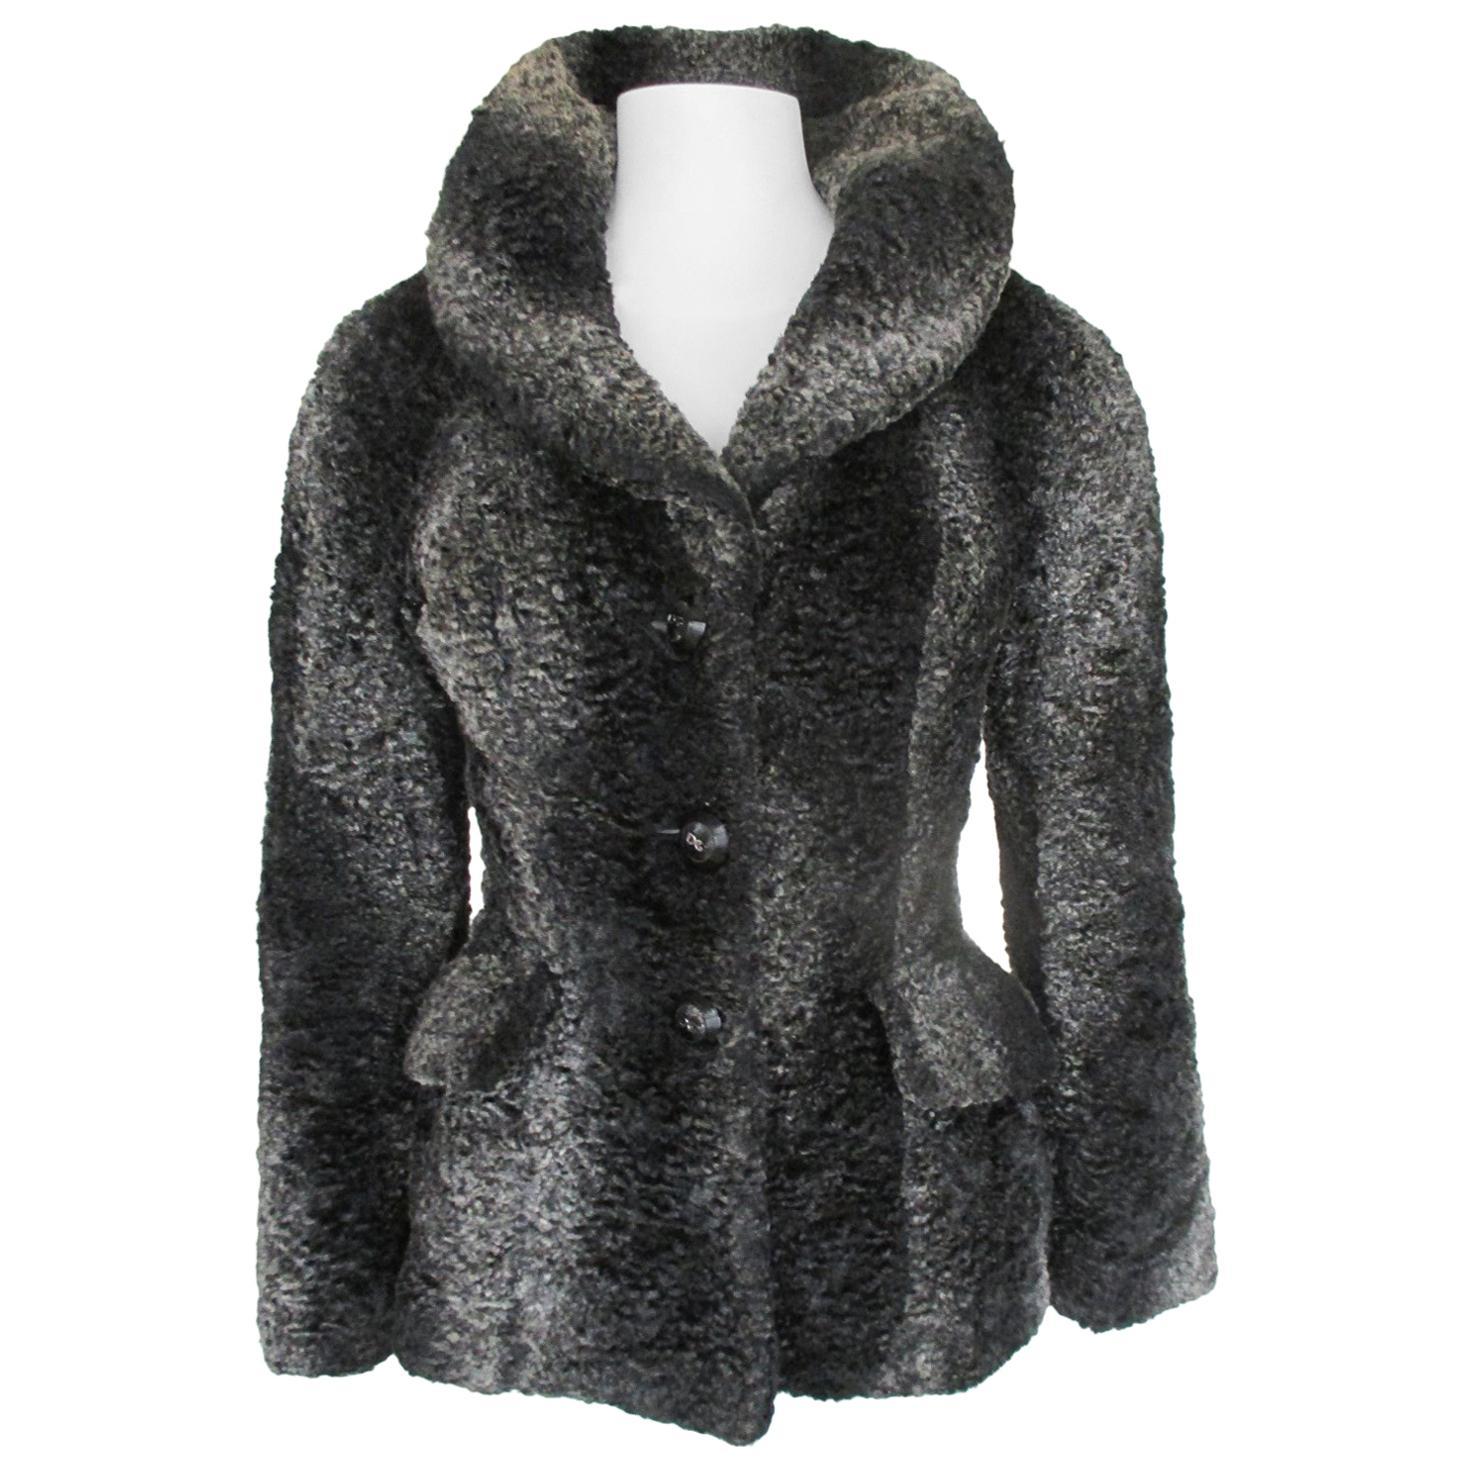 Dolce & Gabbana Faux Fur Jacket small